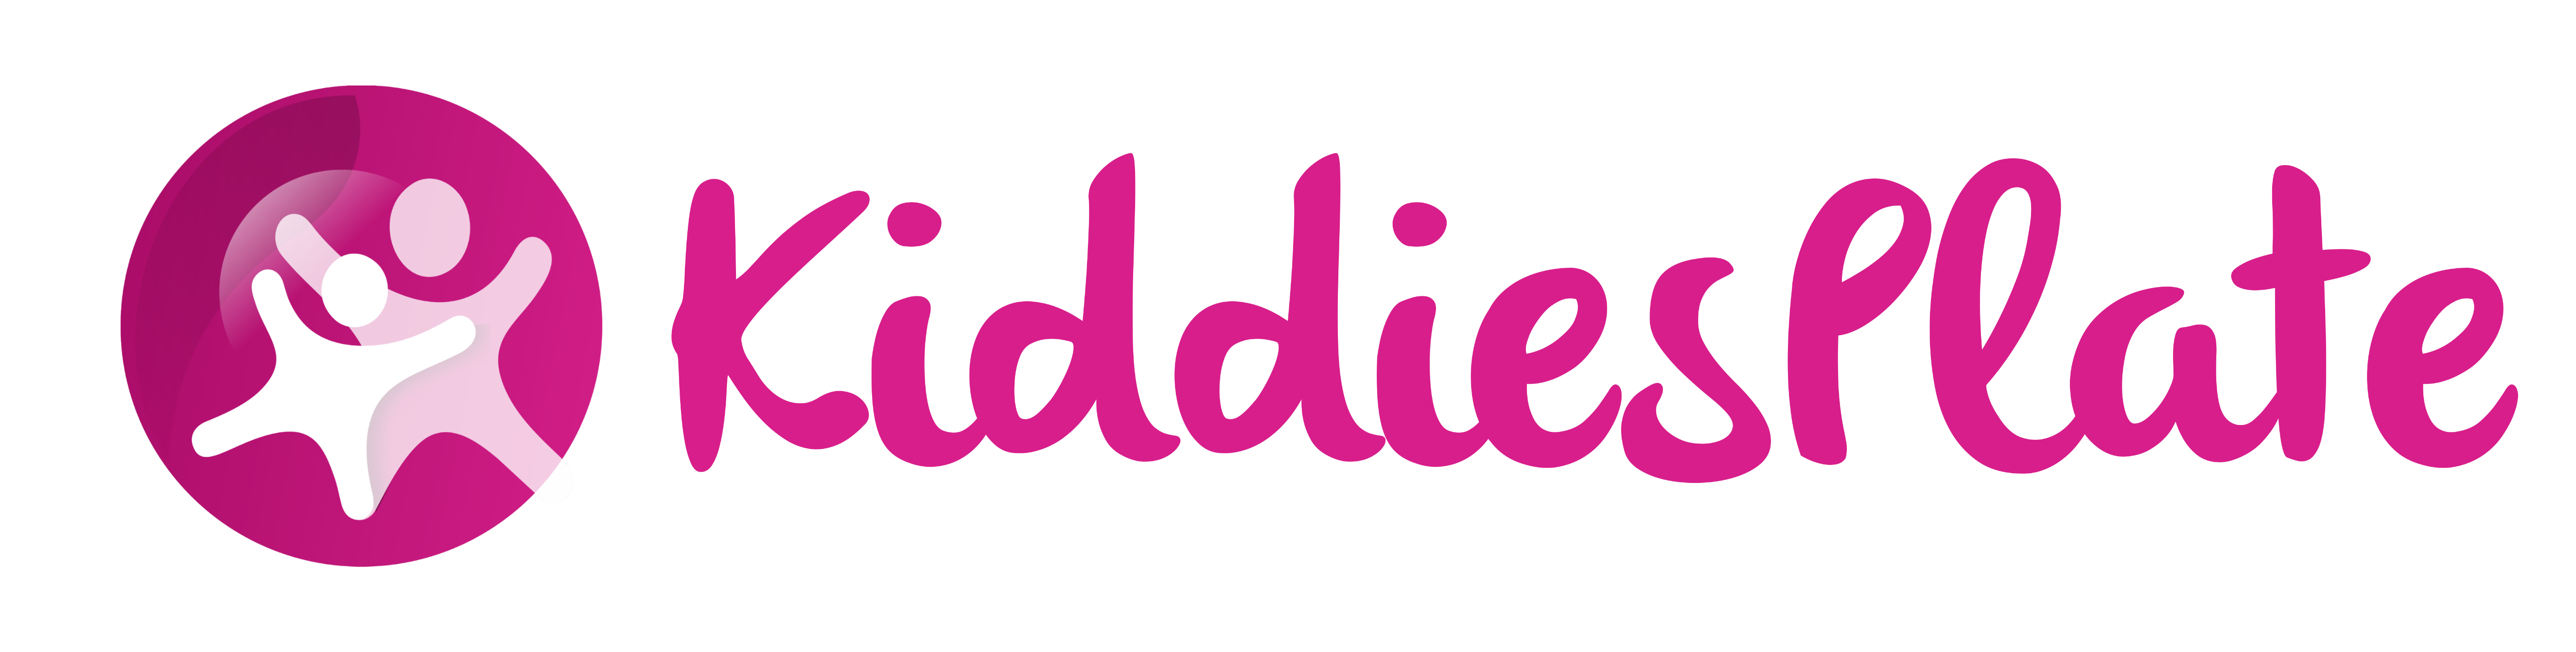 Kiddiesplate